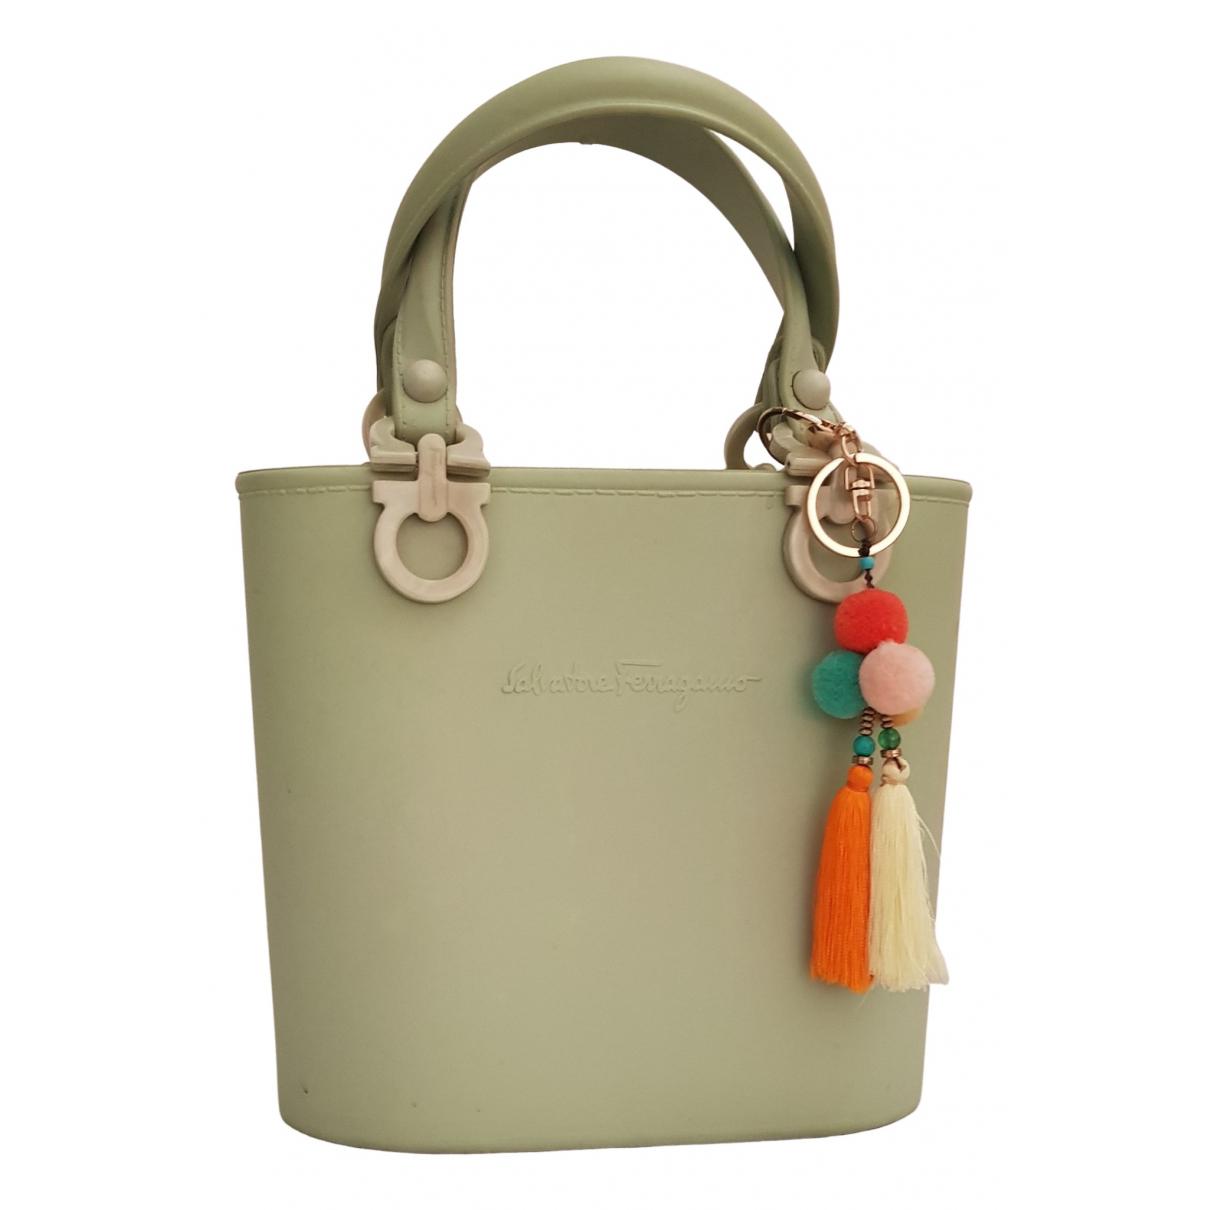 Salvatore Ferragamo \N Green handbag for Women \N